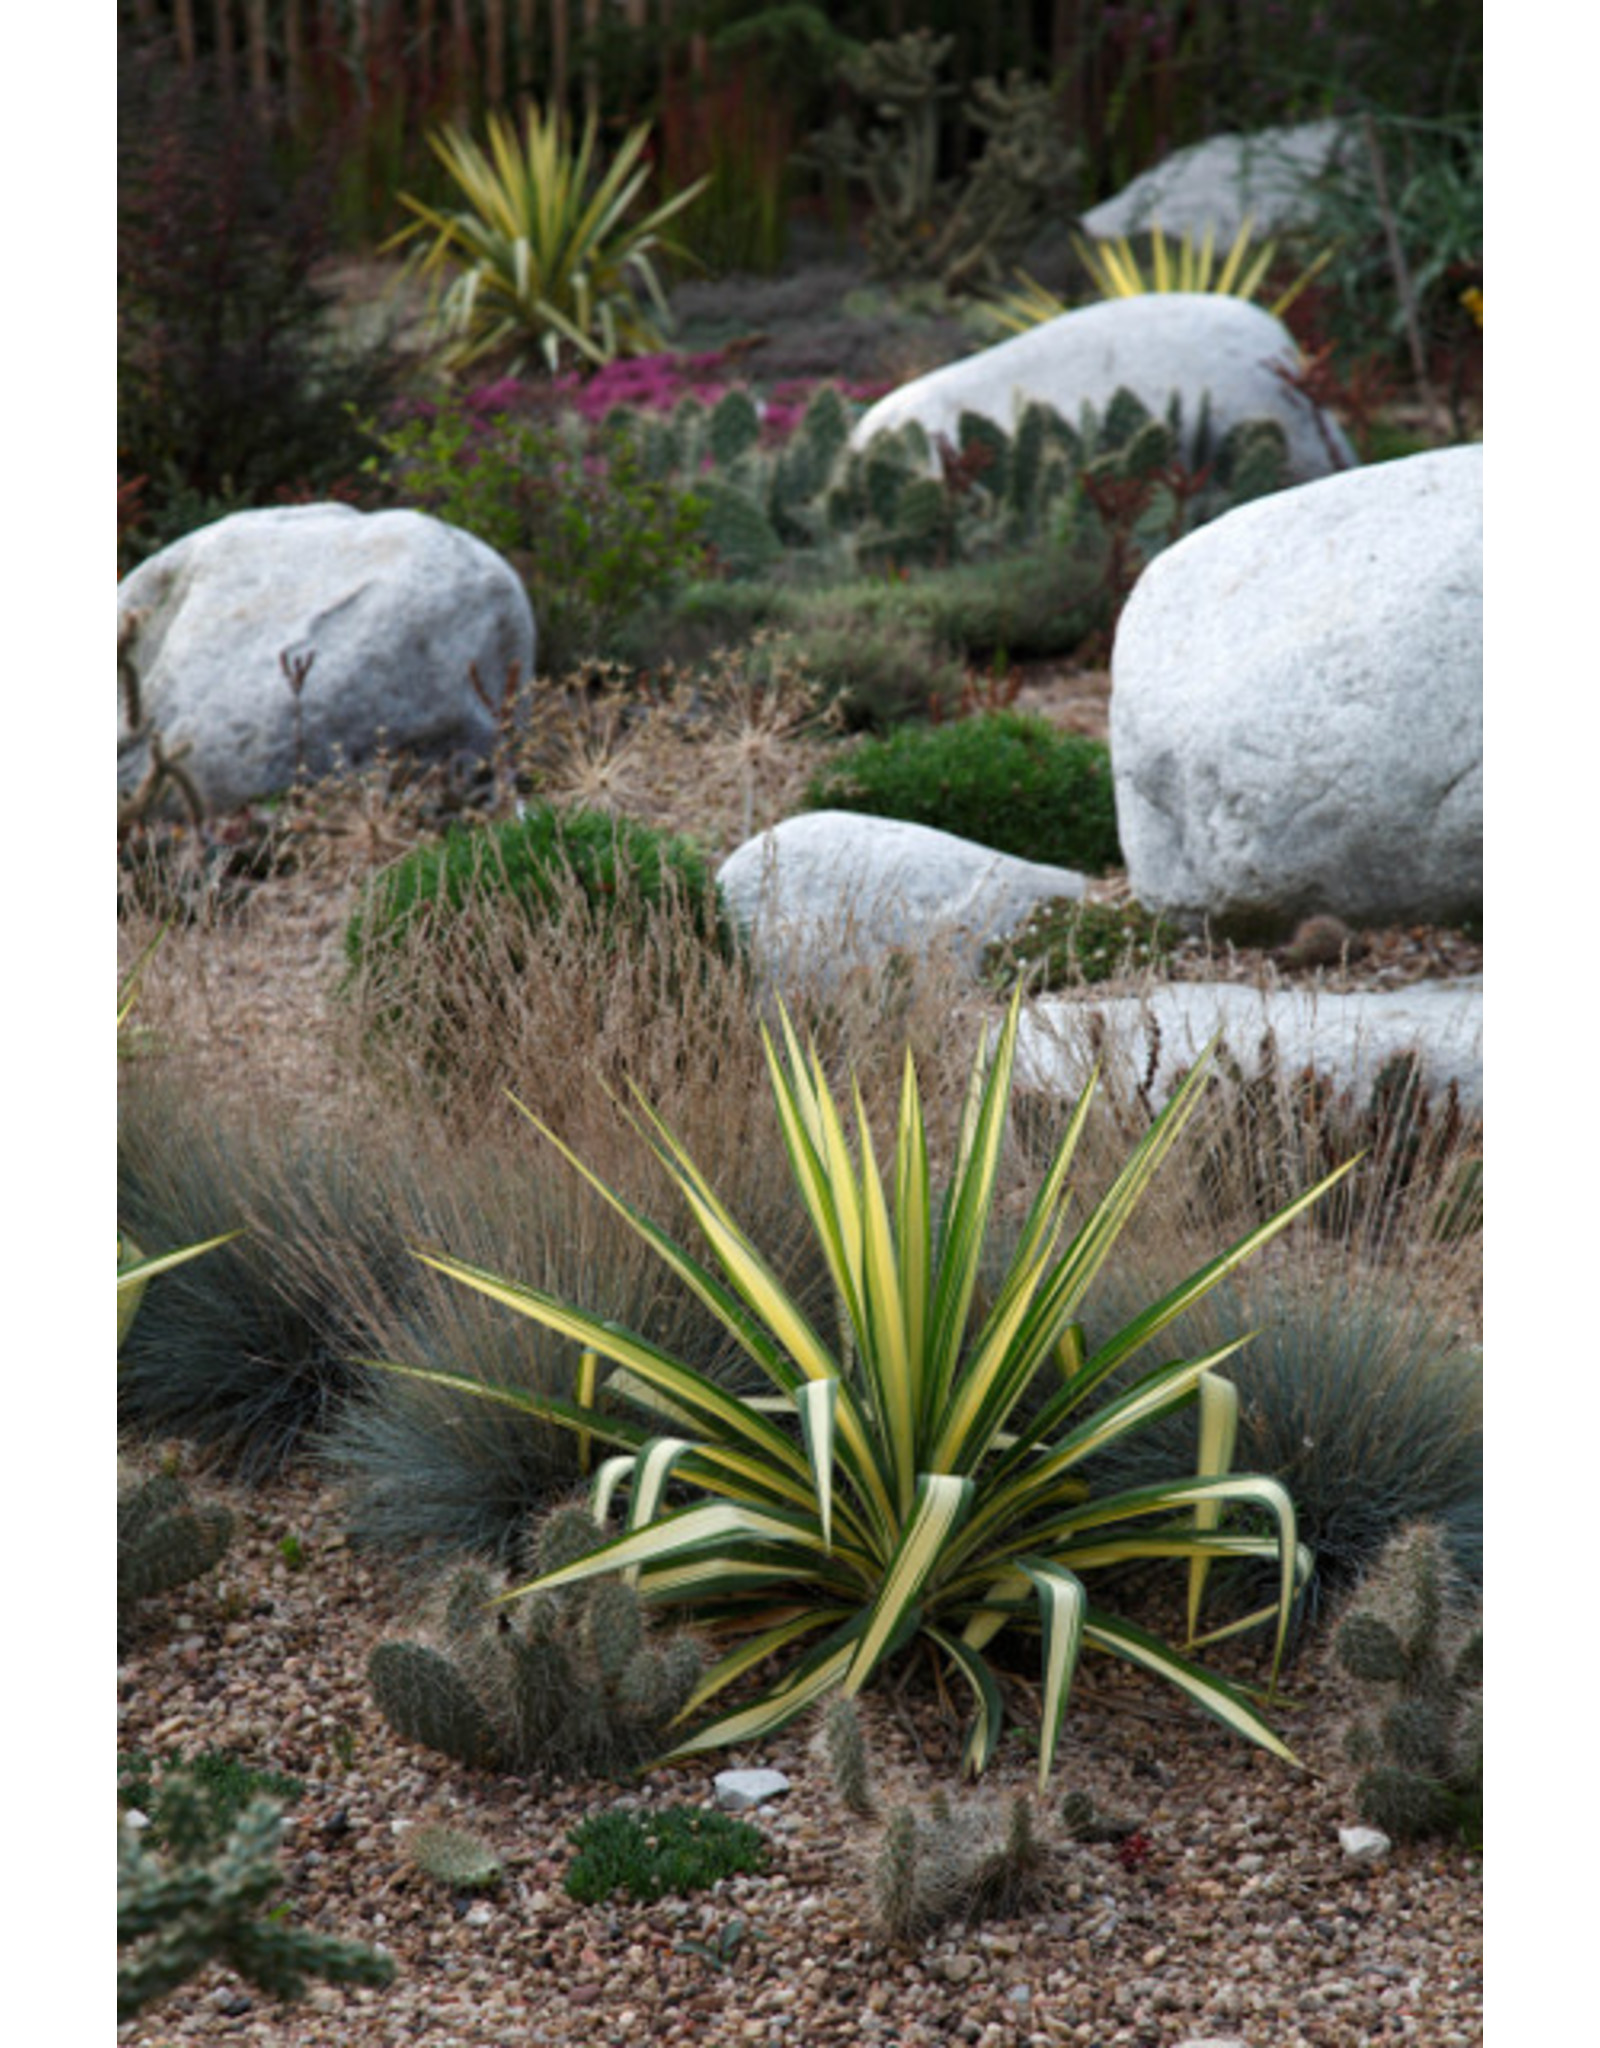 Yucca - Yucca filamnetosa 'Color Guard' - 1 Gallon